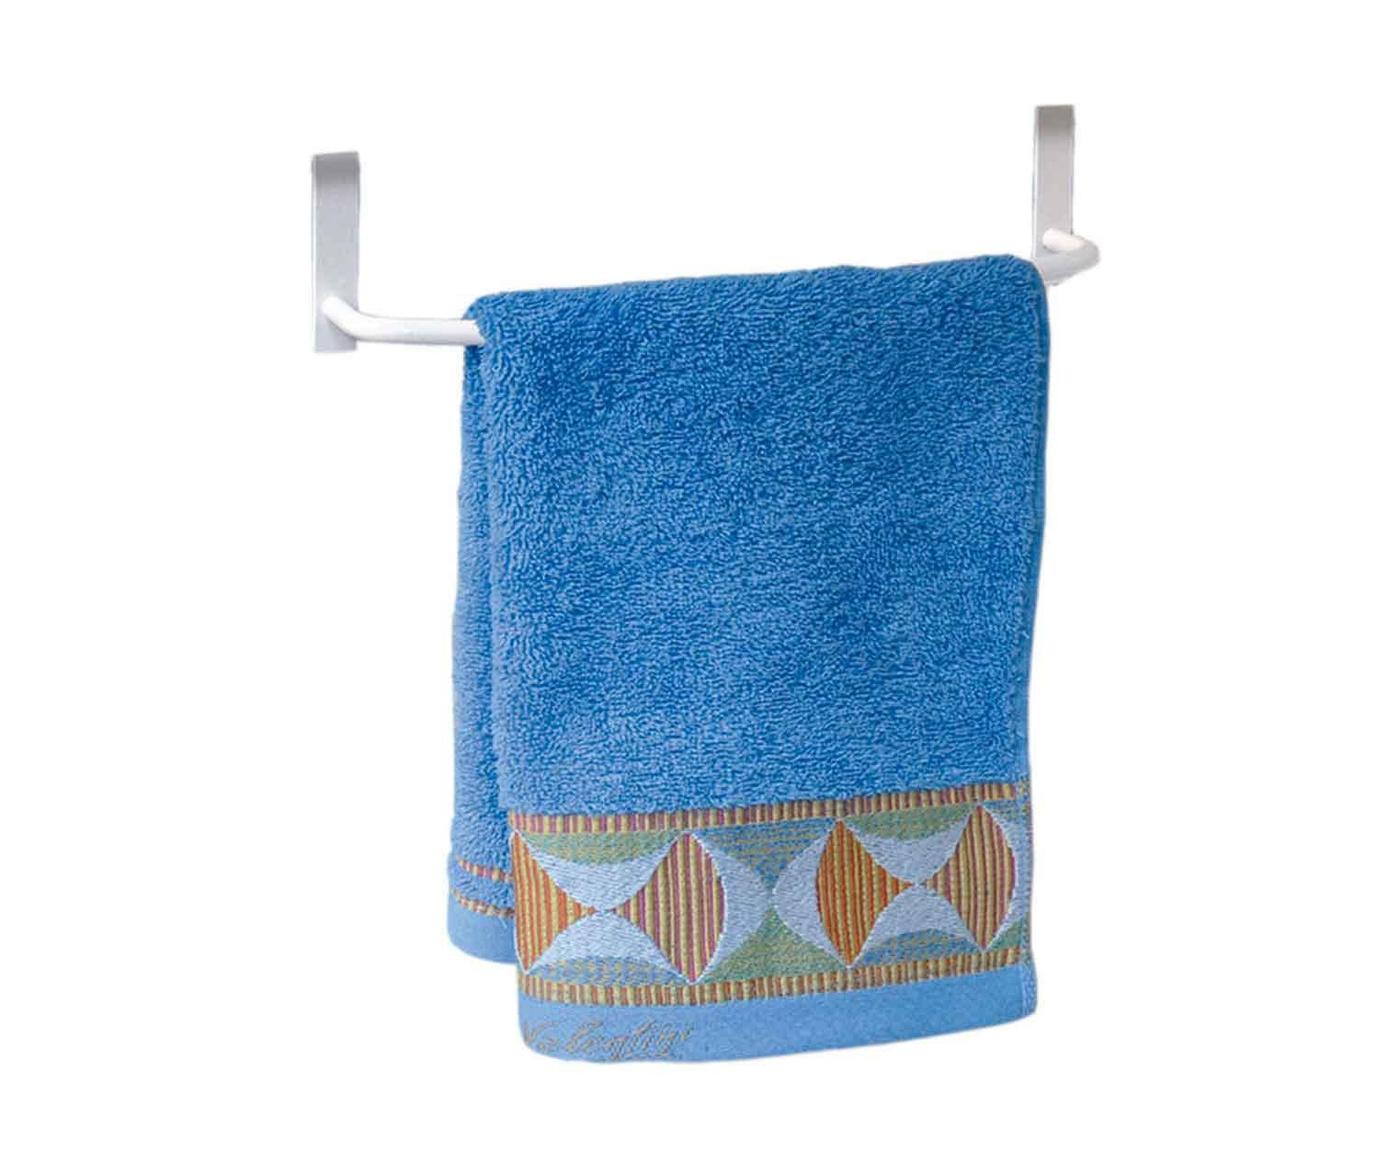 Držač za ručnike za vrata Vurmin